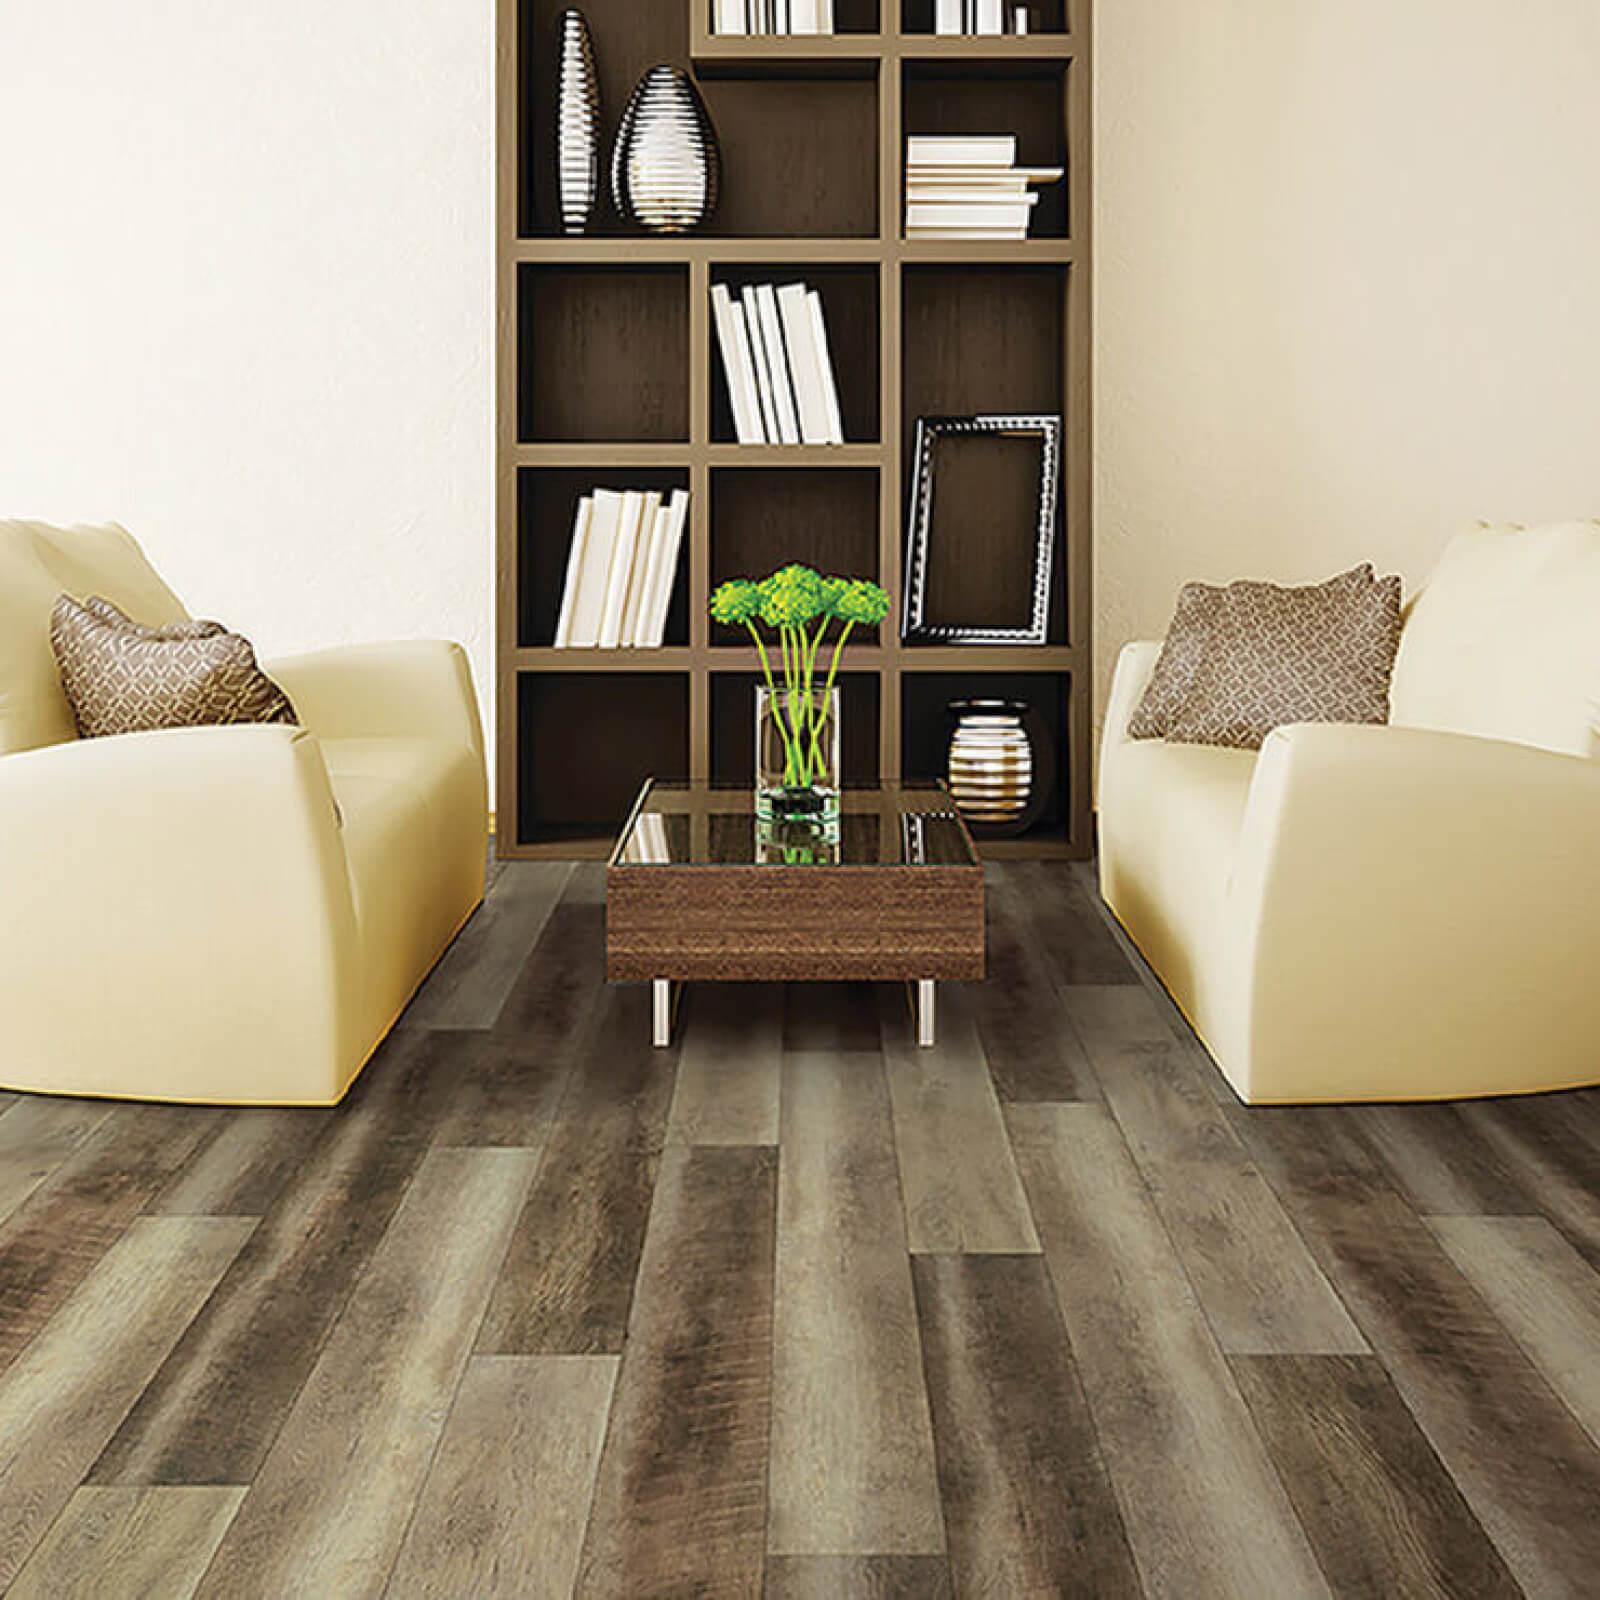 Vinyl flooring | McSwain Carpet & Floors